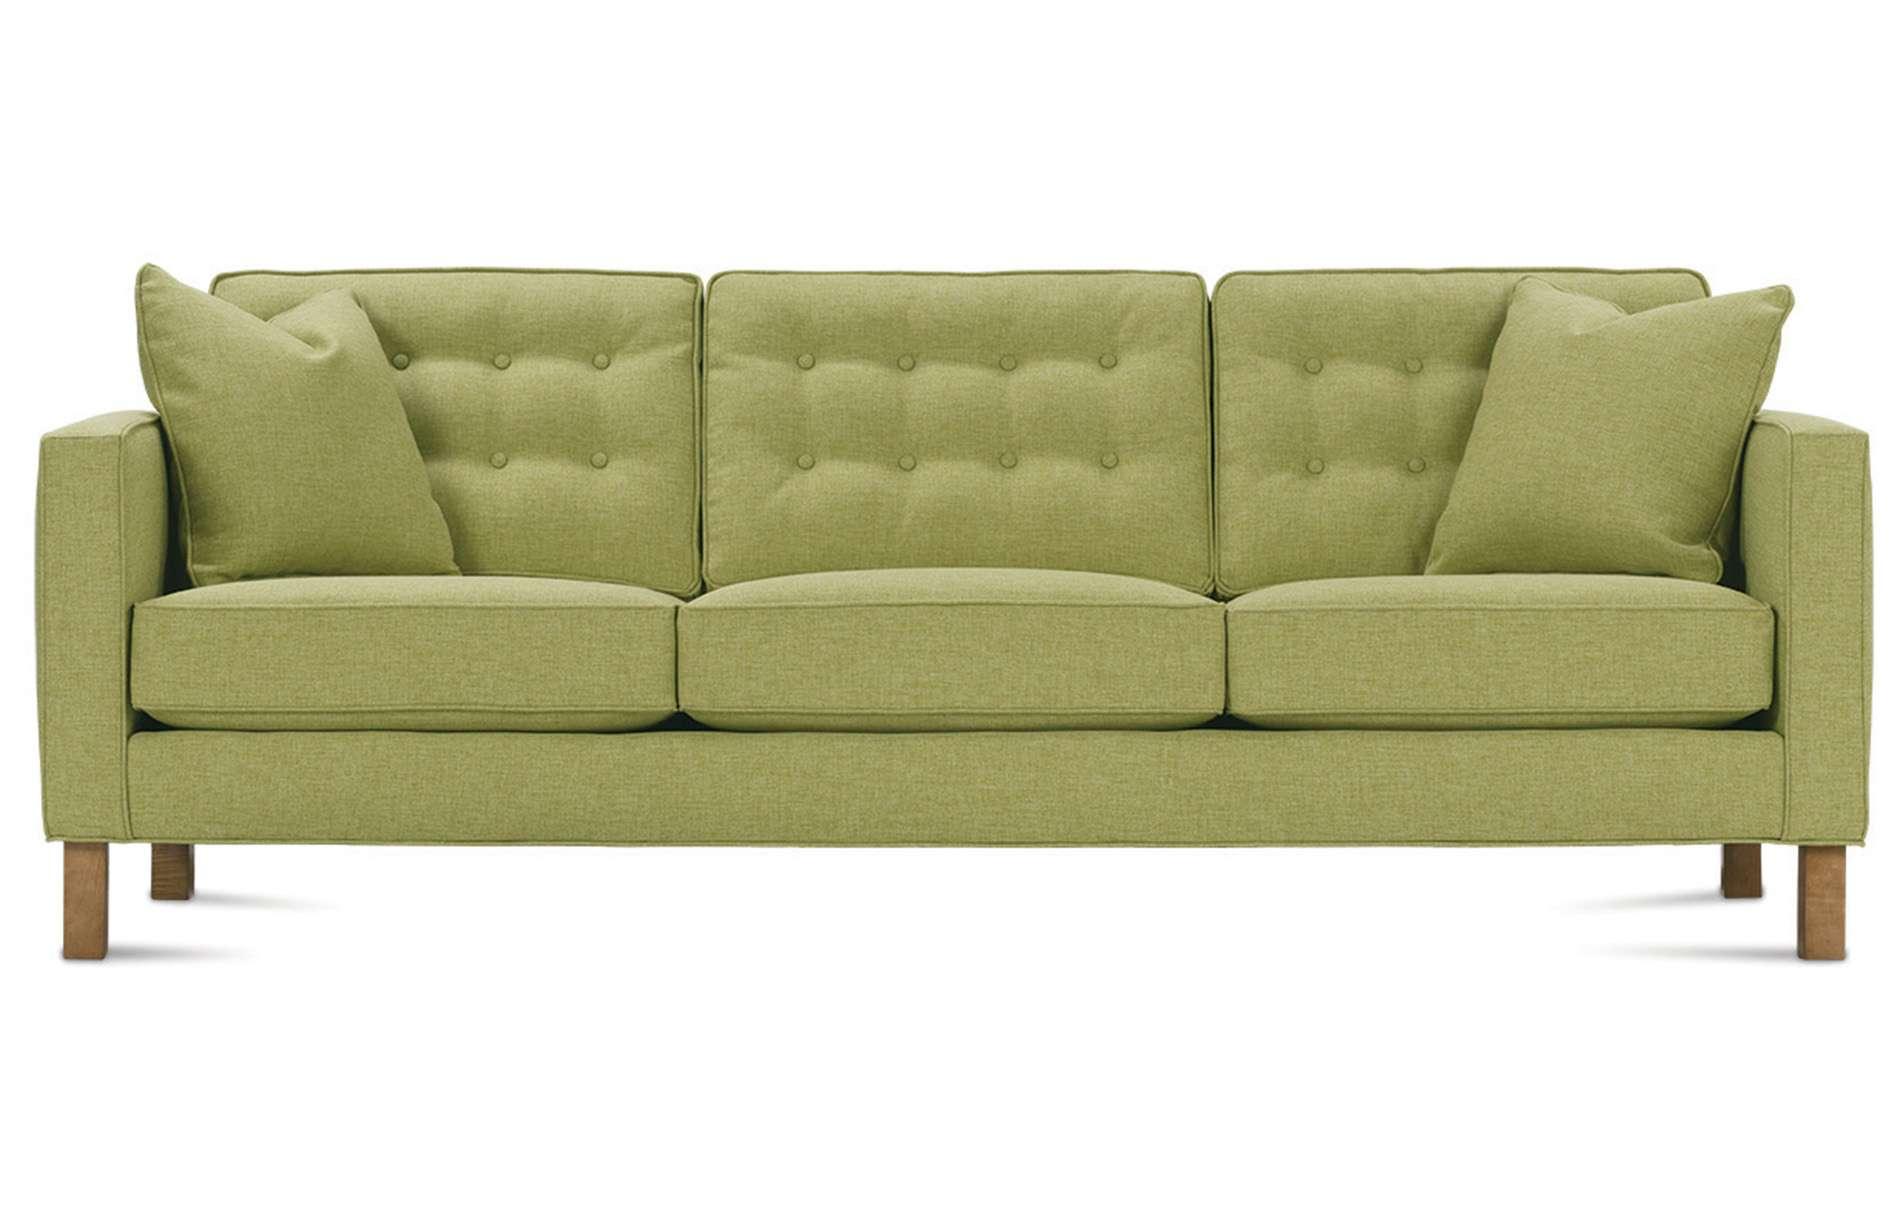 lime green sofa.jpg